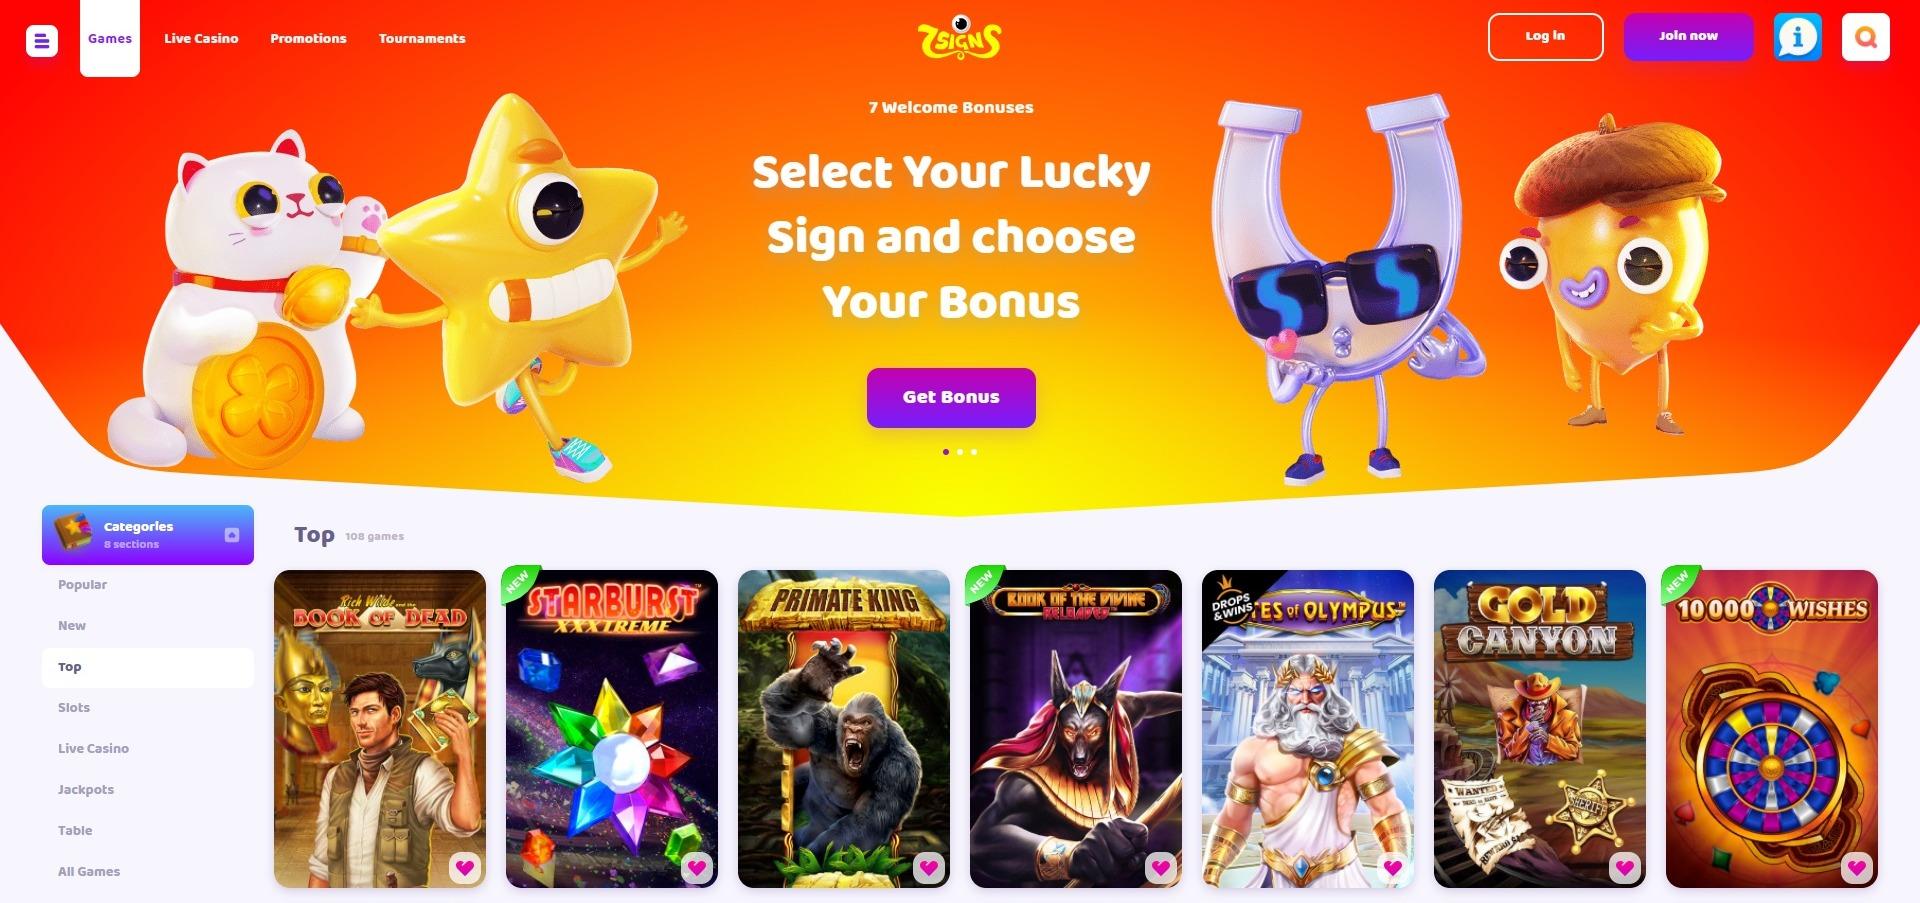 Casino Games at 7signs